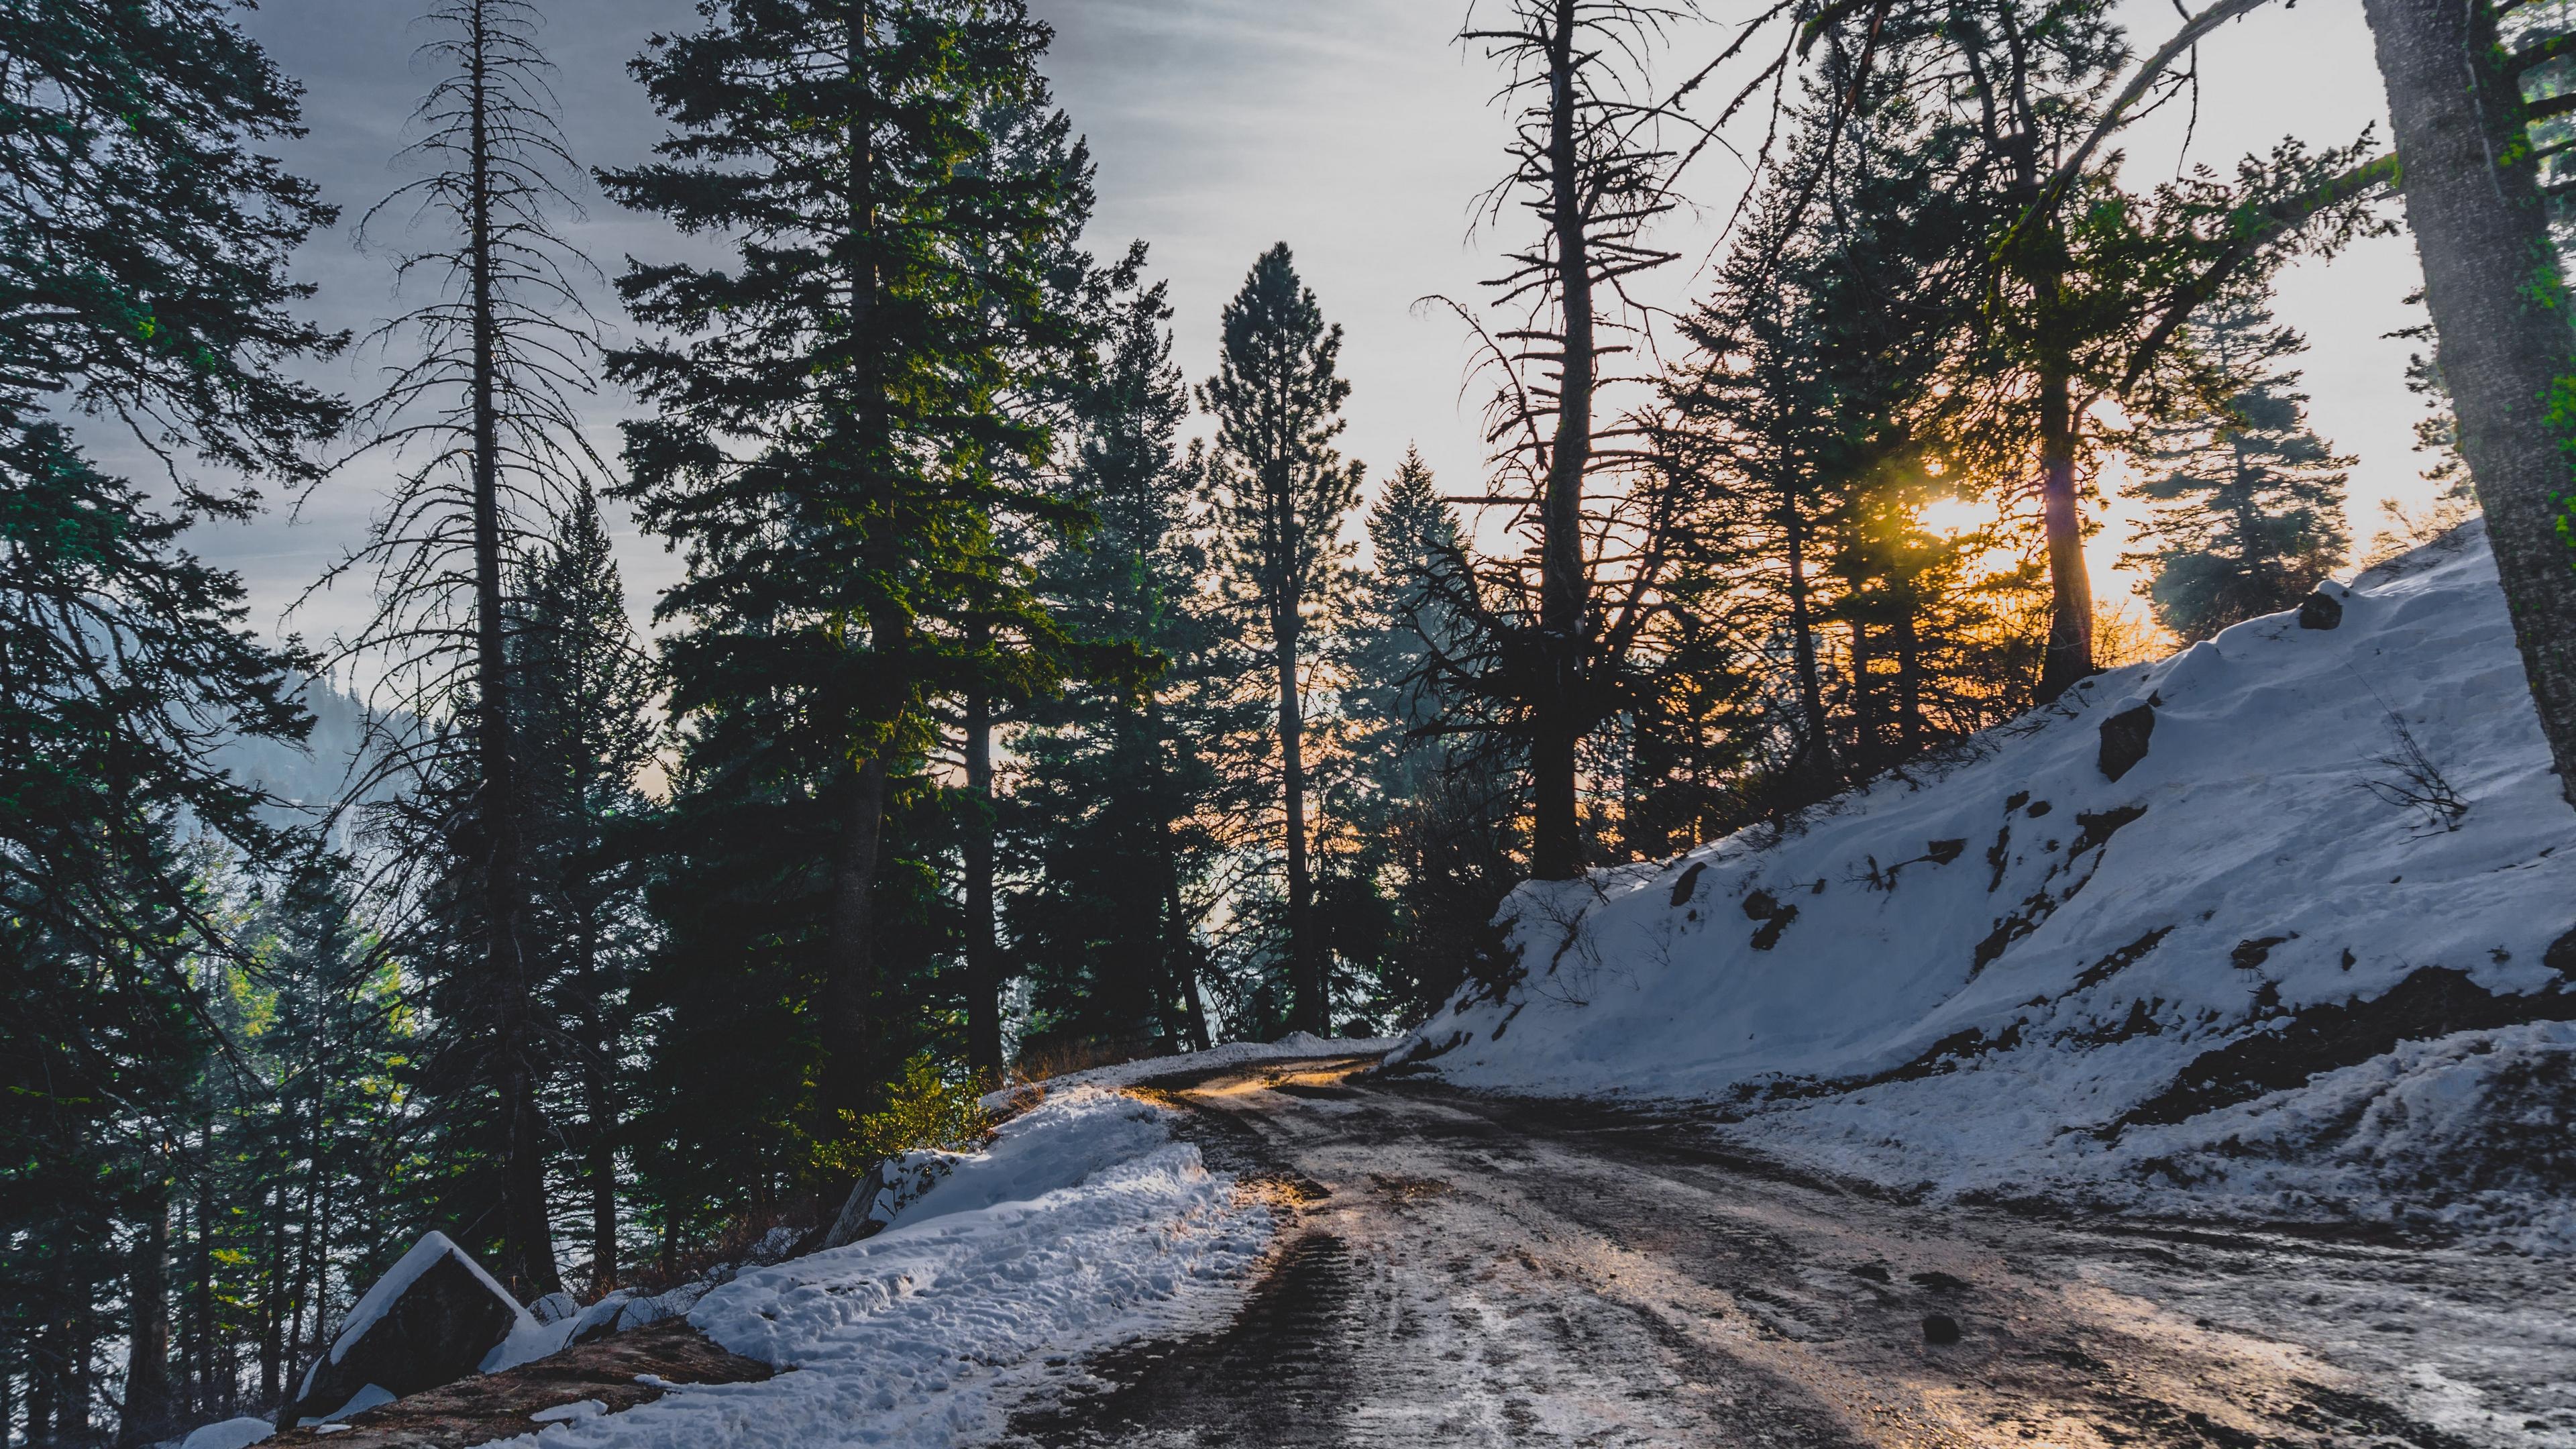 snow winter trees road 4k 1541114425 - snow, winter, trees, road 4k - Winter, Trees, Snow